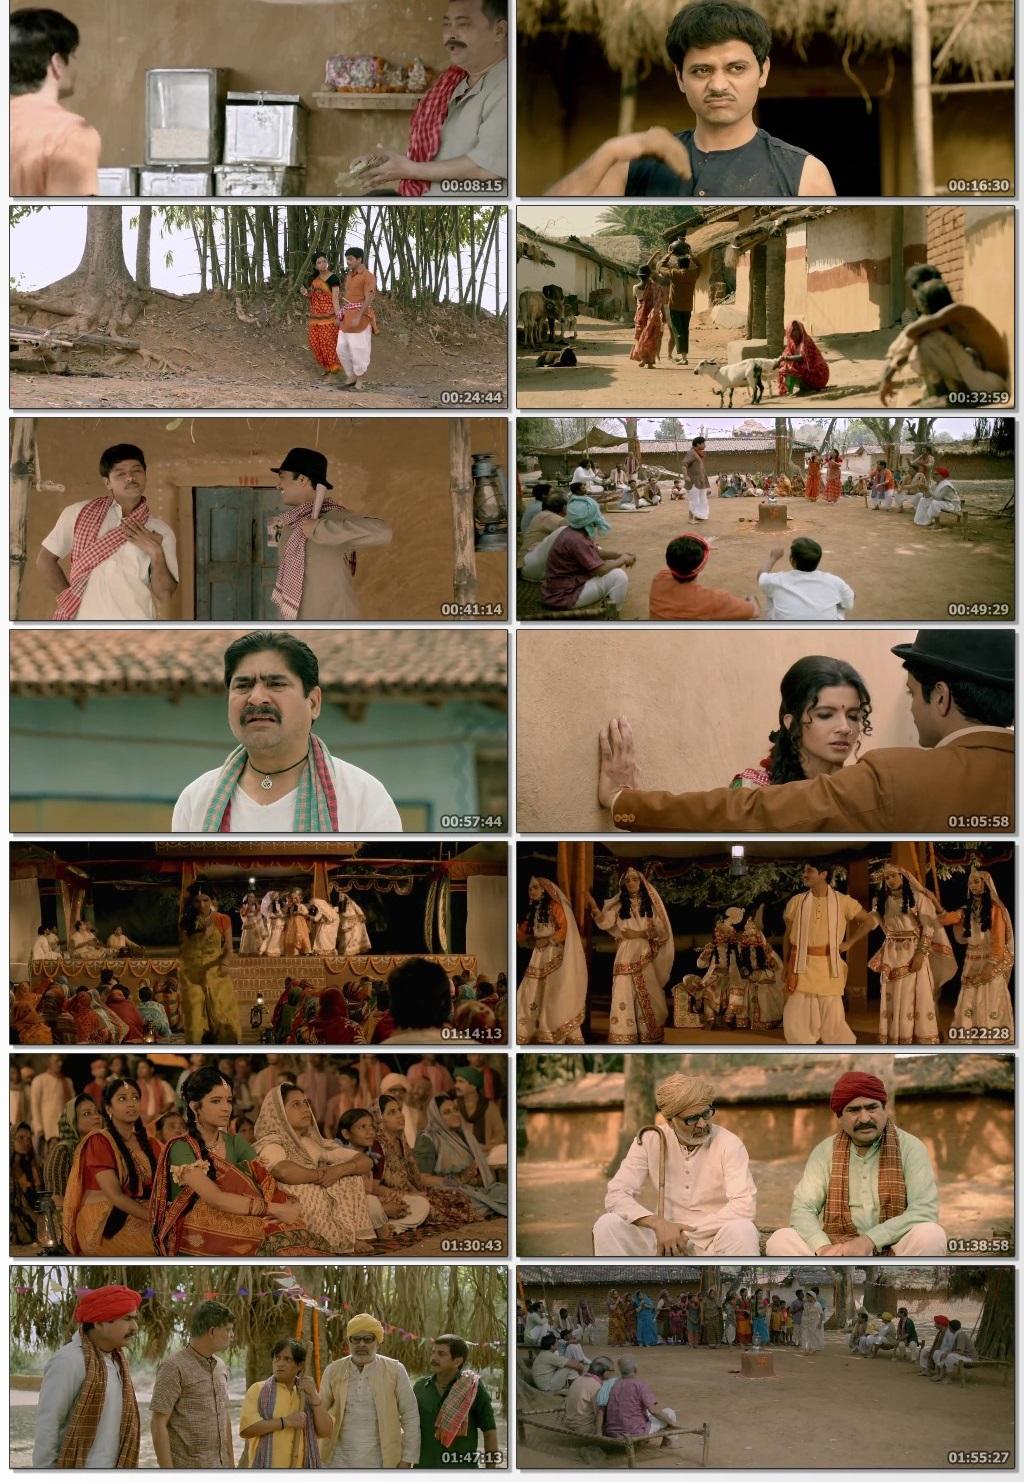 Panchlait-2017-www-1kmovies-cyou-Hindi-Movie-720p-MX-HDRip-850-MB-mkv-thumbs